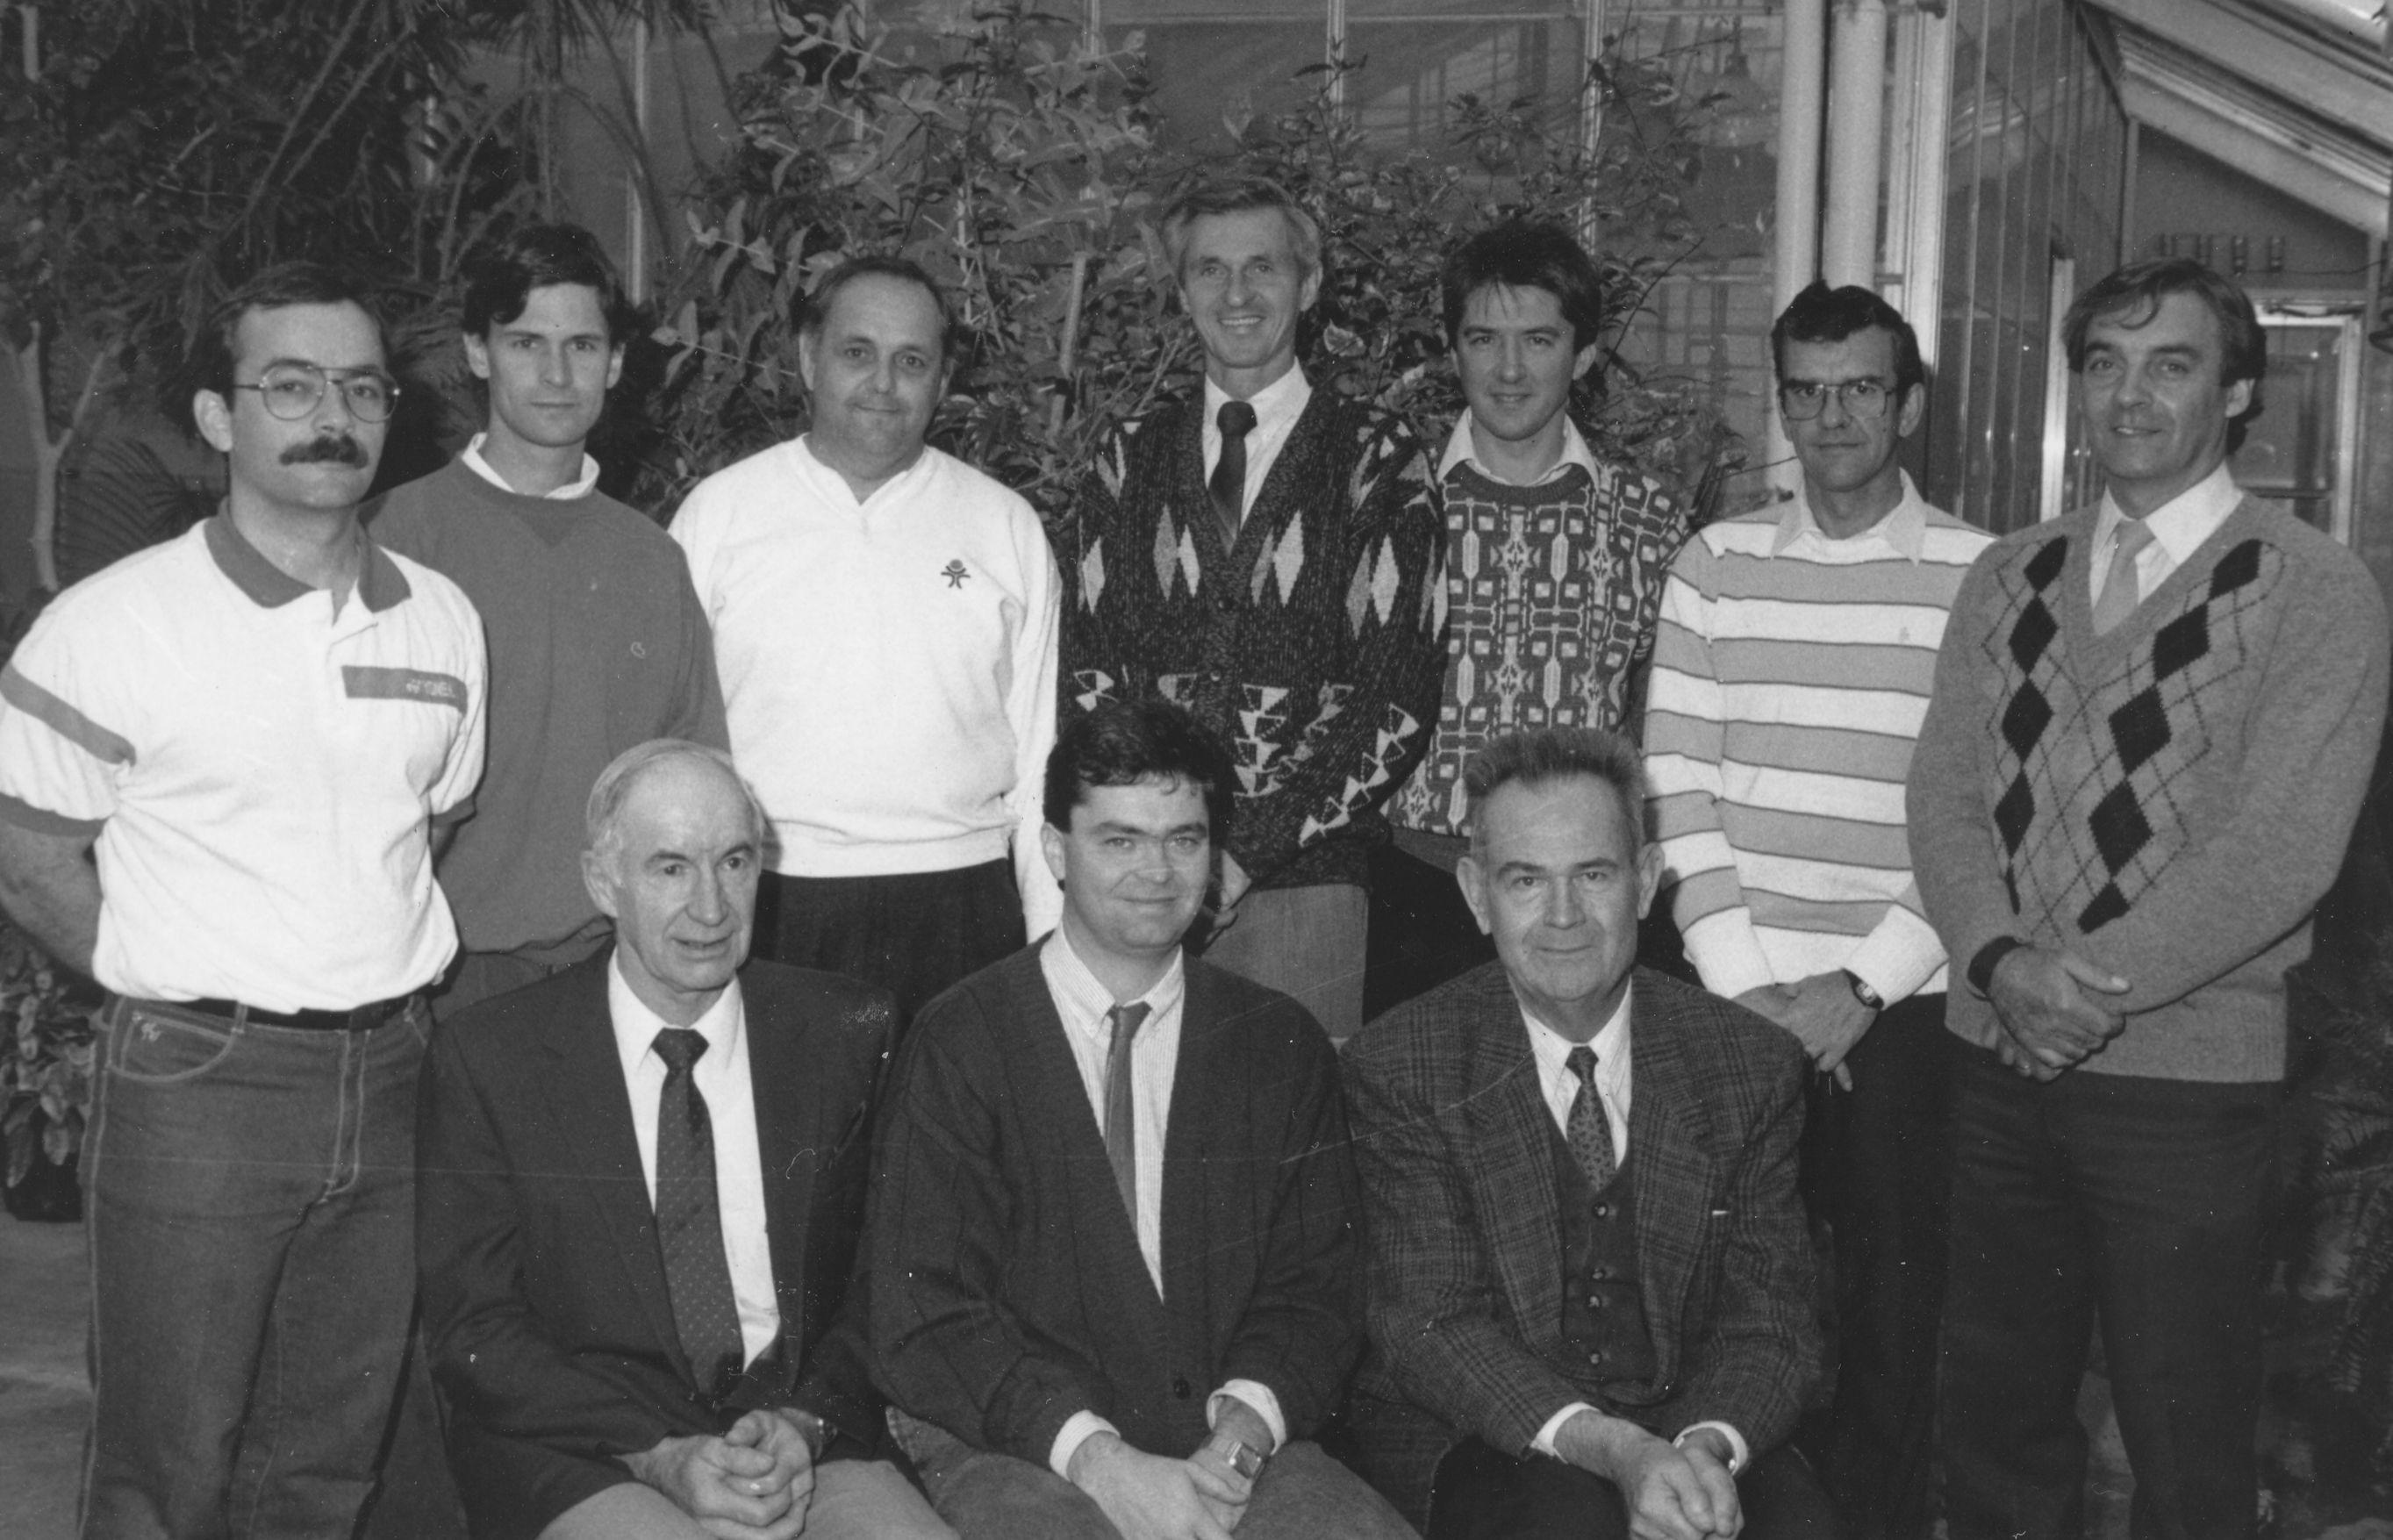 1990-Génie Rural-Jean Corbeil-Jean-Pierre Lessard-Gerard Mourot-Richard Deslandes-Richard Dupere-